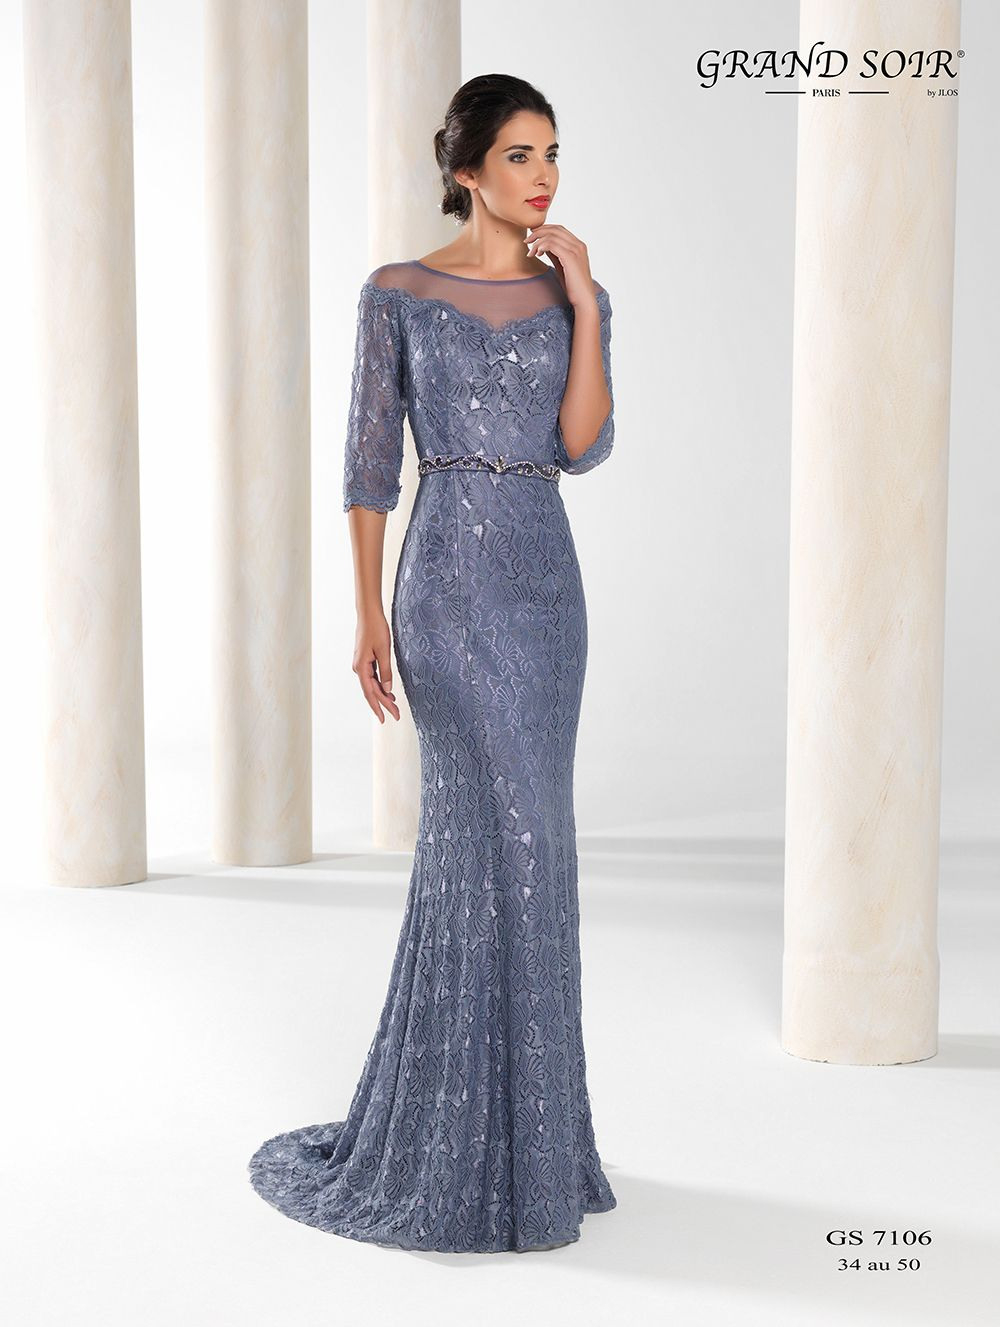 20 Perfekt Abendkleid Figurbetont BoutiqueFormal Einfach Abendkleid Figurbetont Ärmel